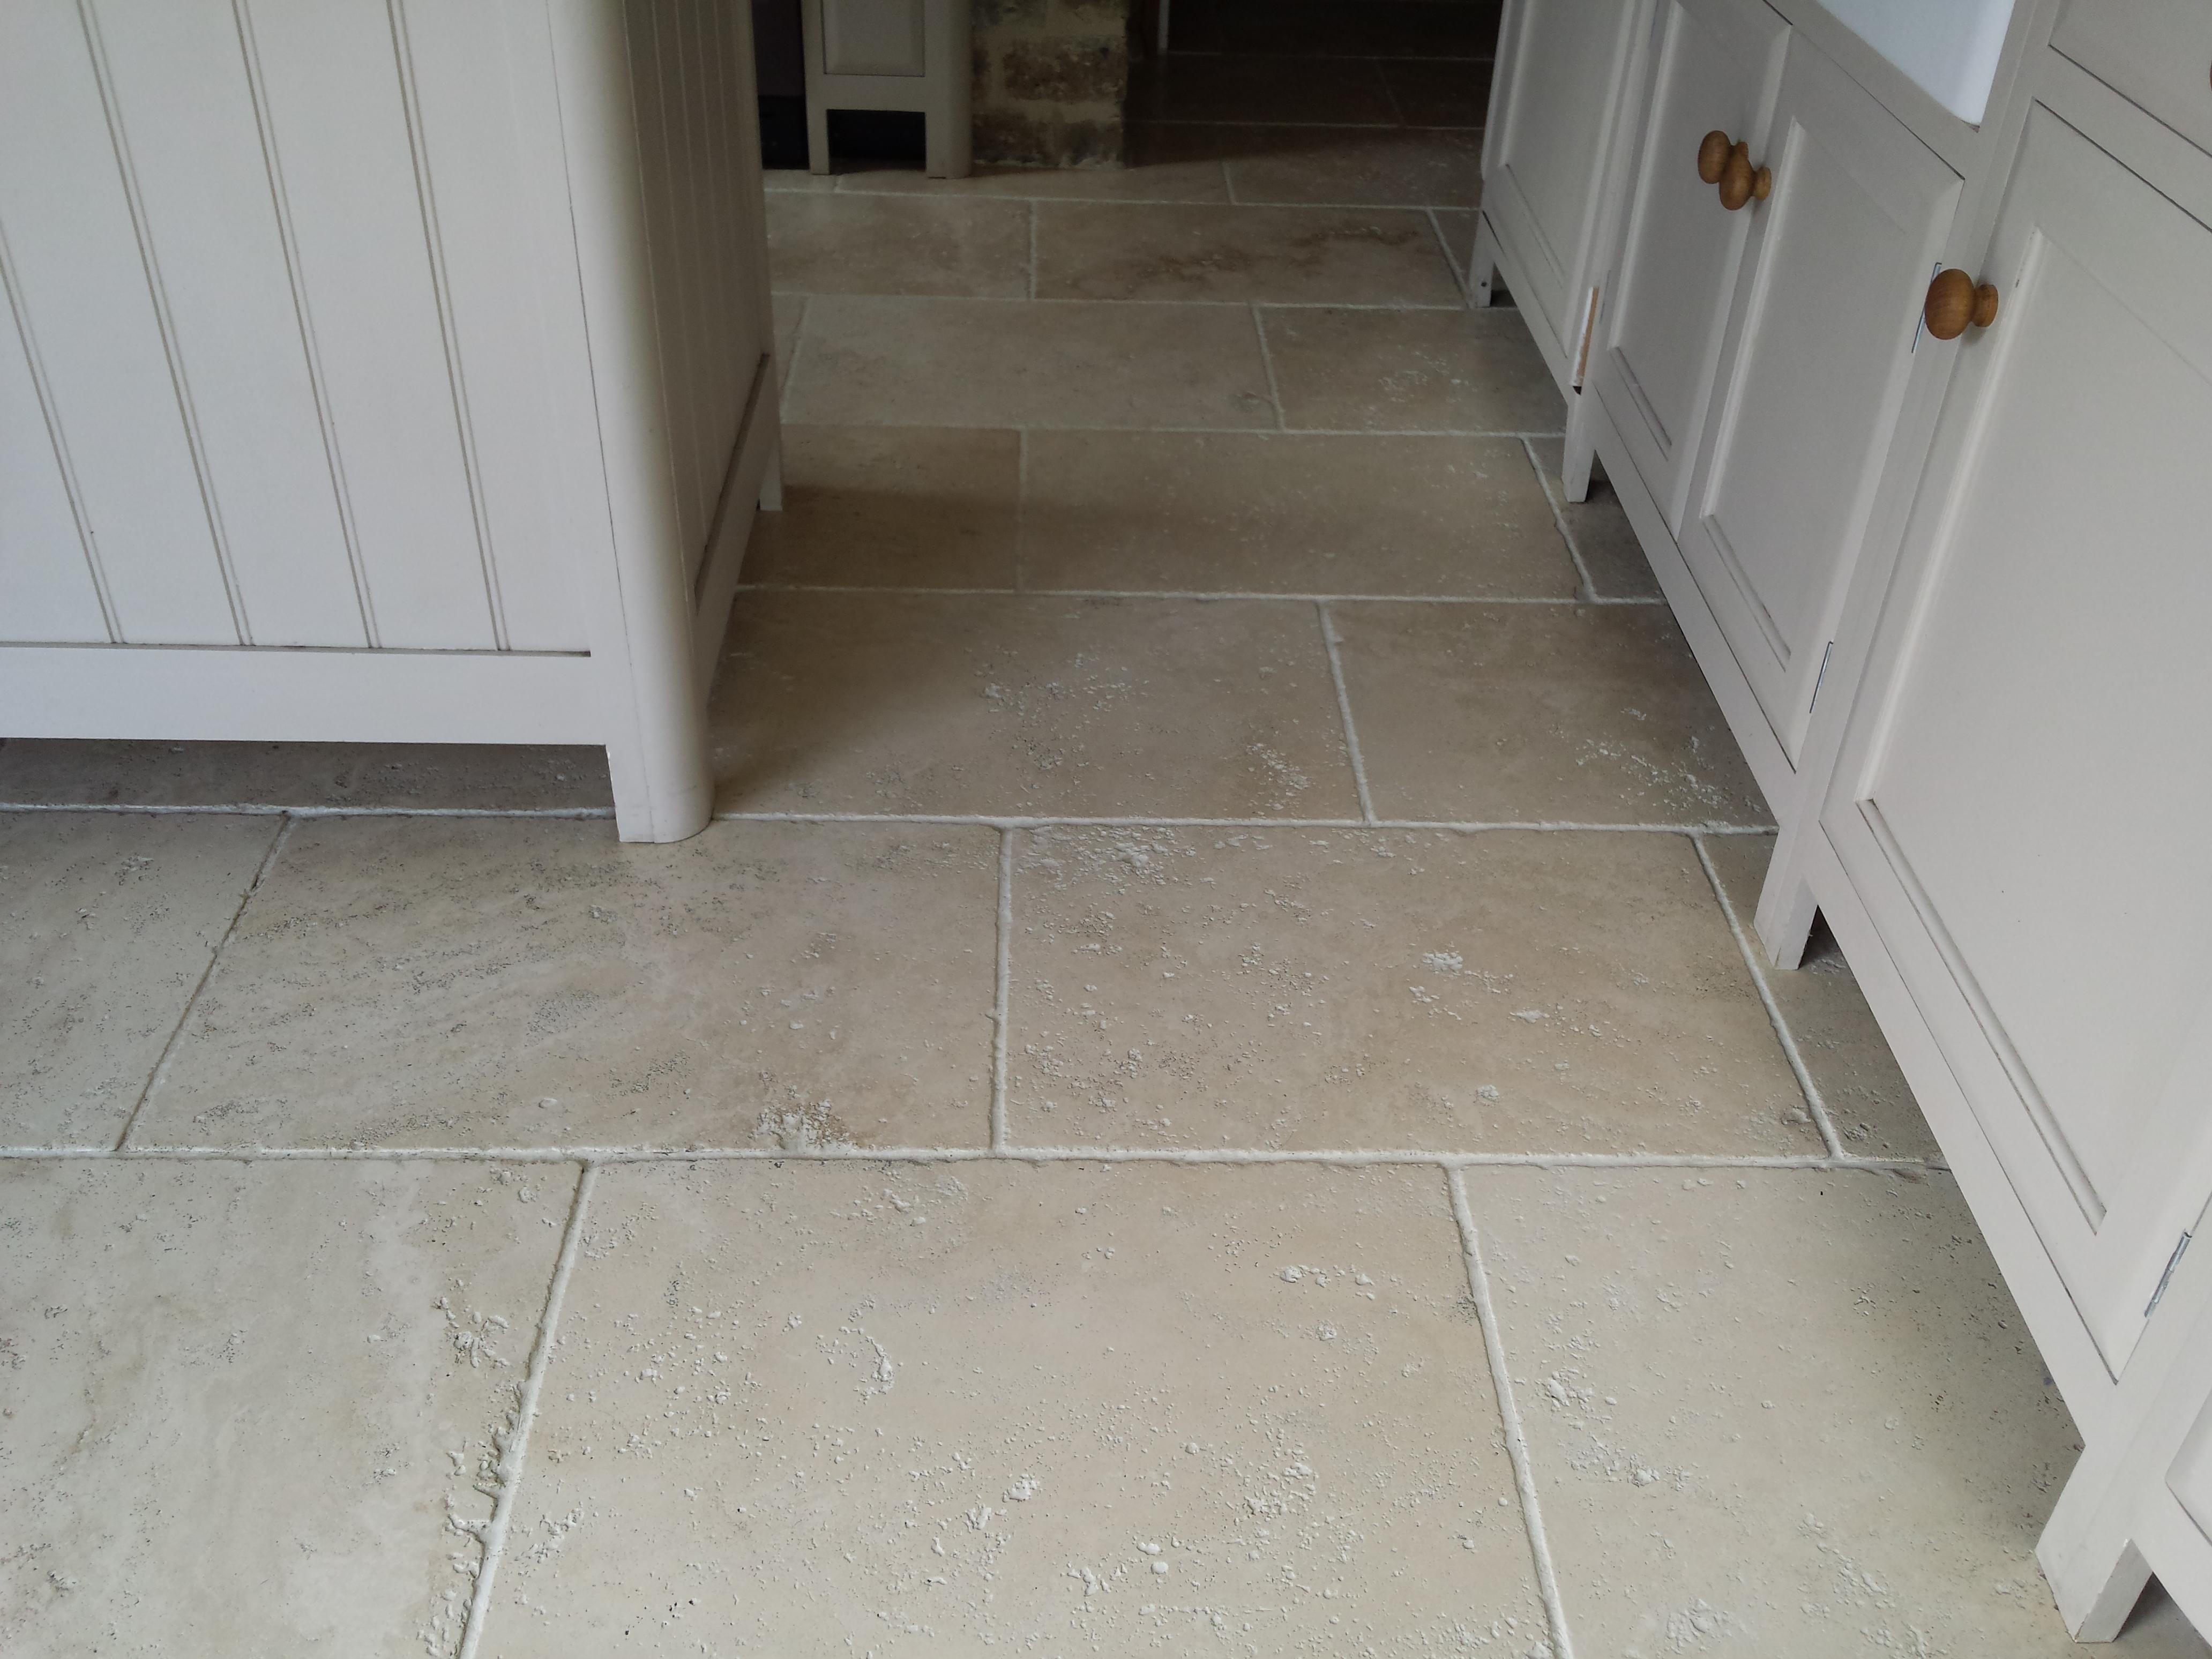 Travertine floor cleaner carpet vidalondon for Floor cleaning services